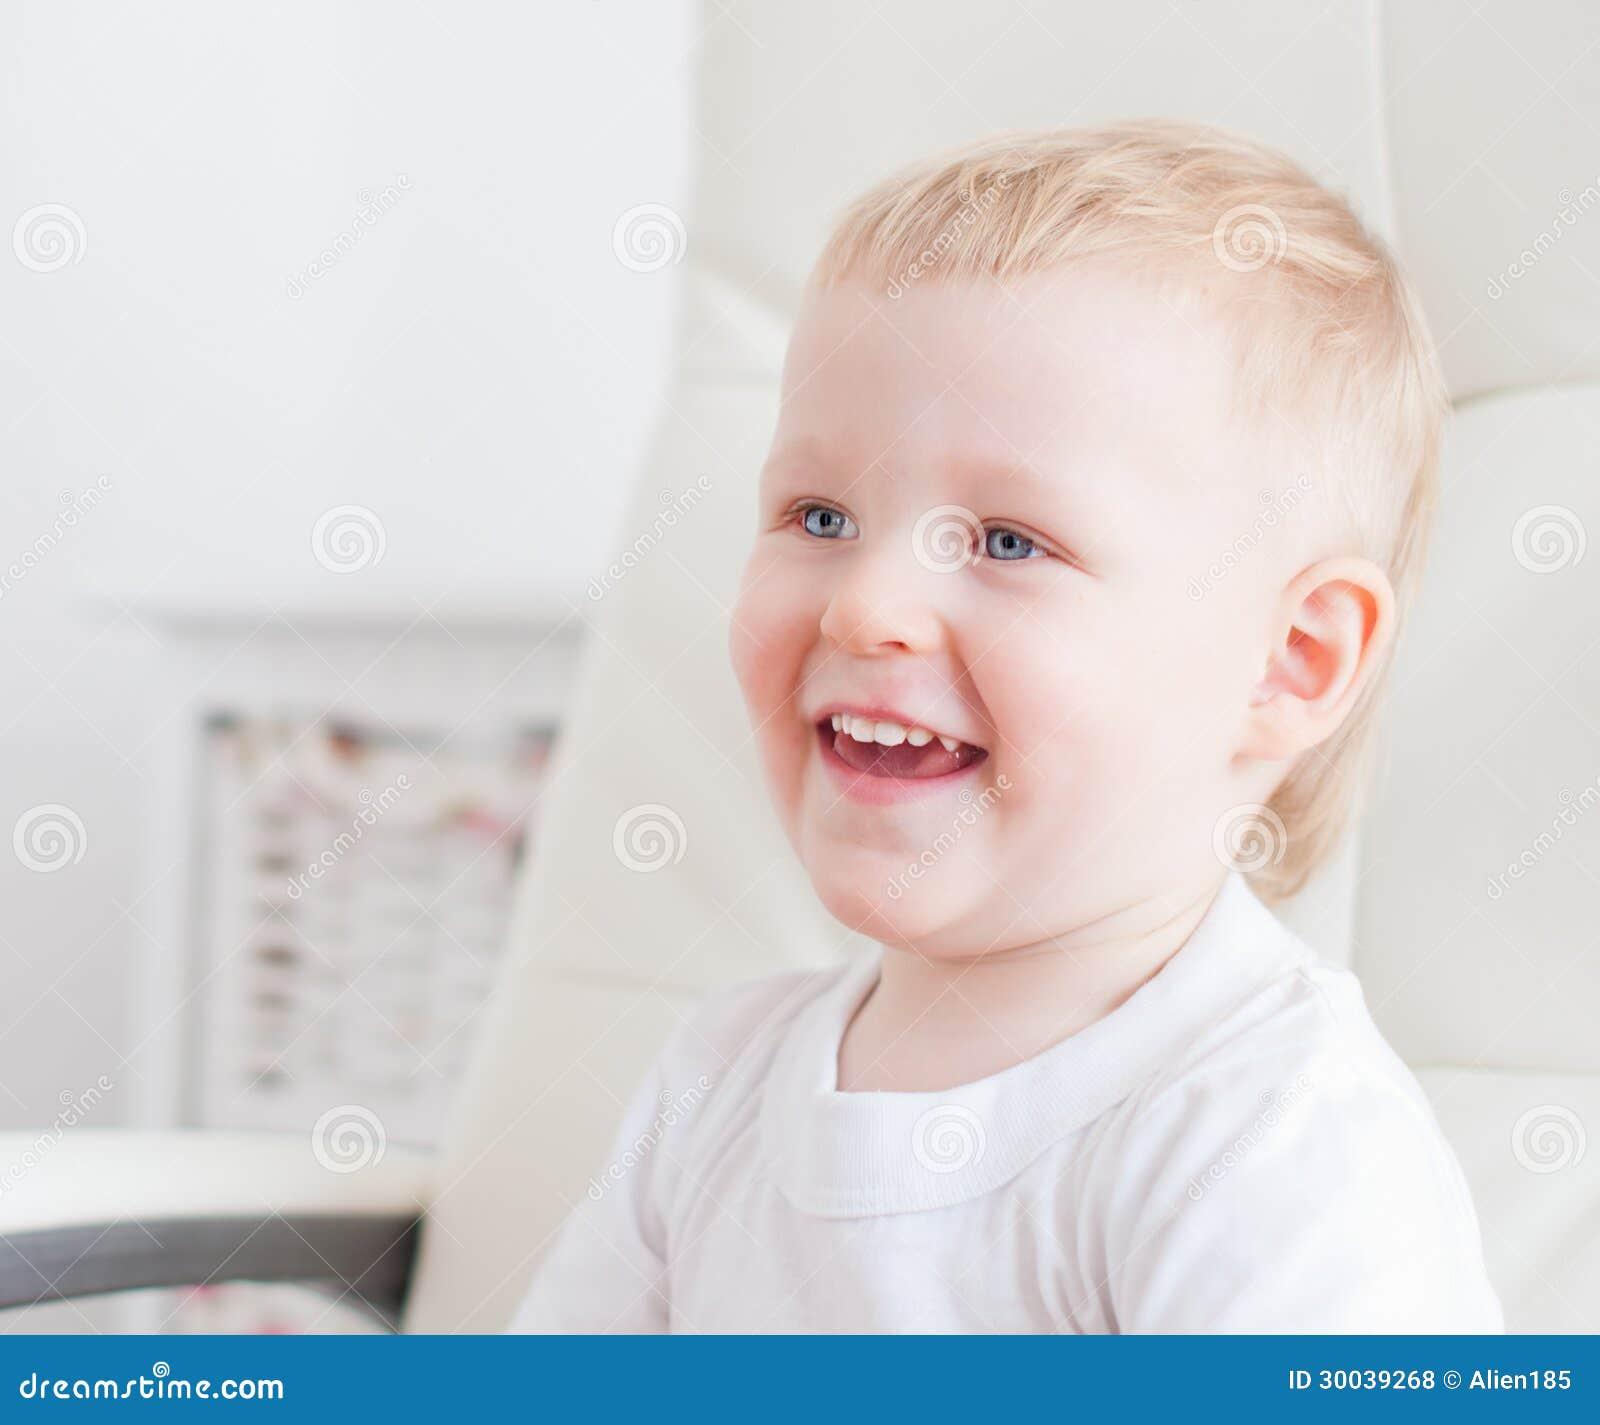 Weisser Stuhlgang Baby